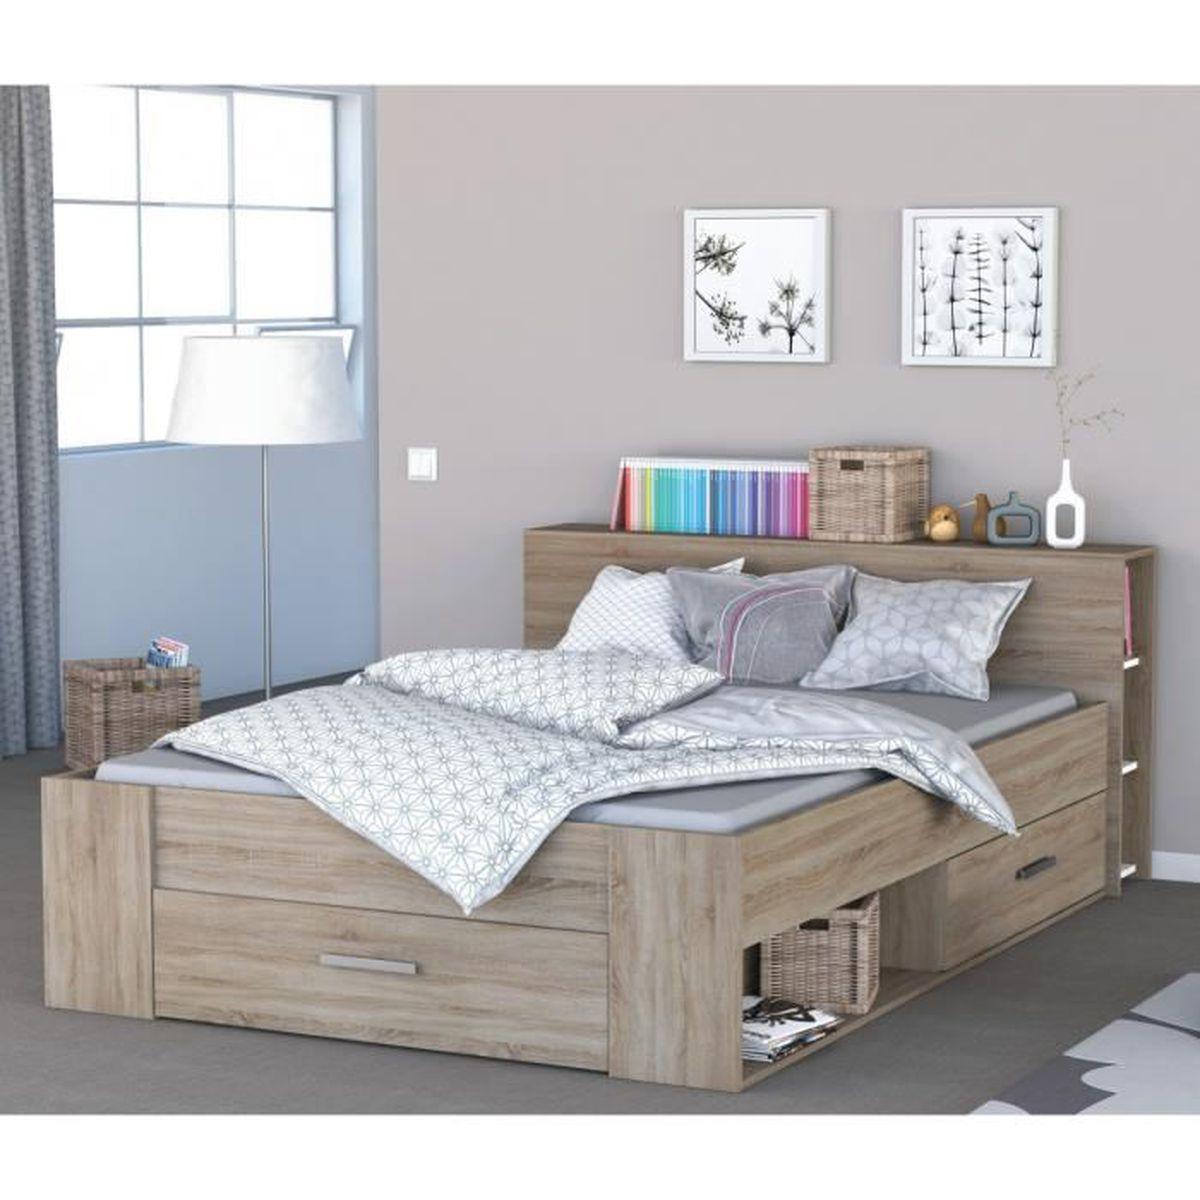 Lit Poutre Bois Massif lit en bois avec tiroir imitation chêne brossé 160x200